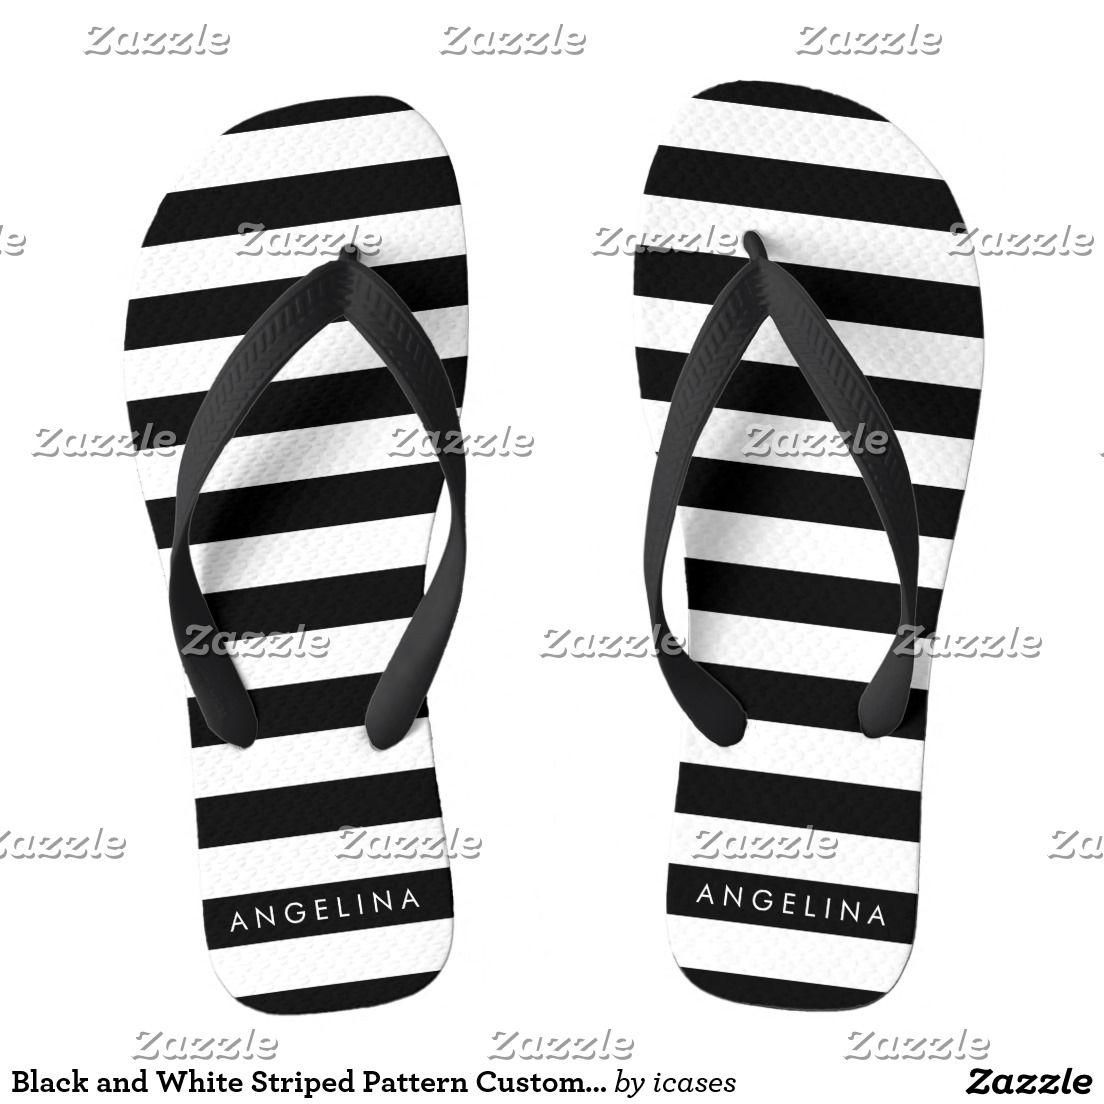 Black and White Striped Pattern Custom Name Flip Flops